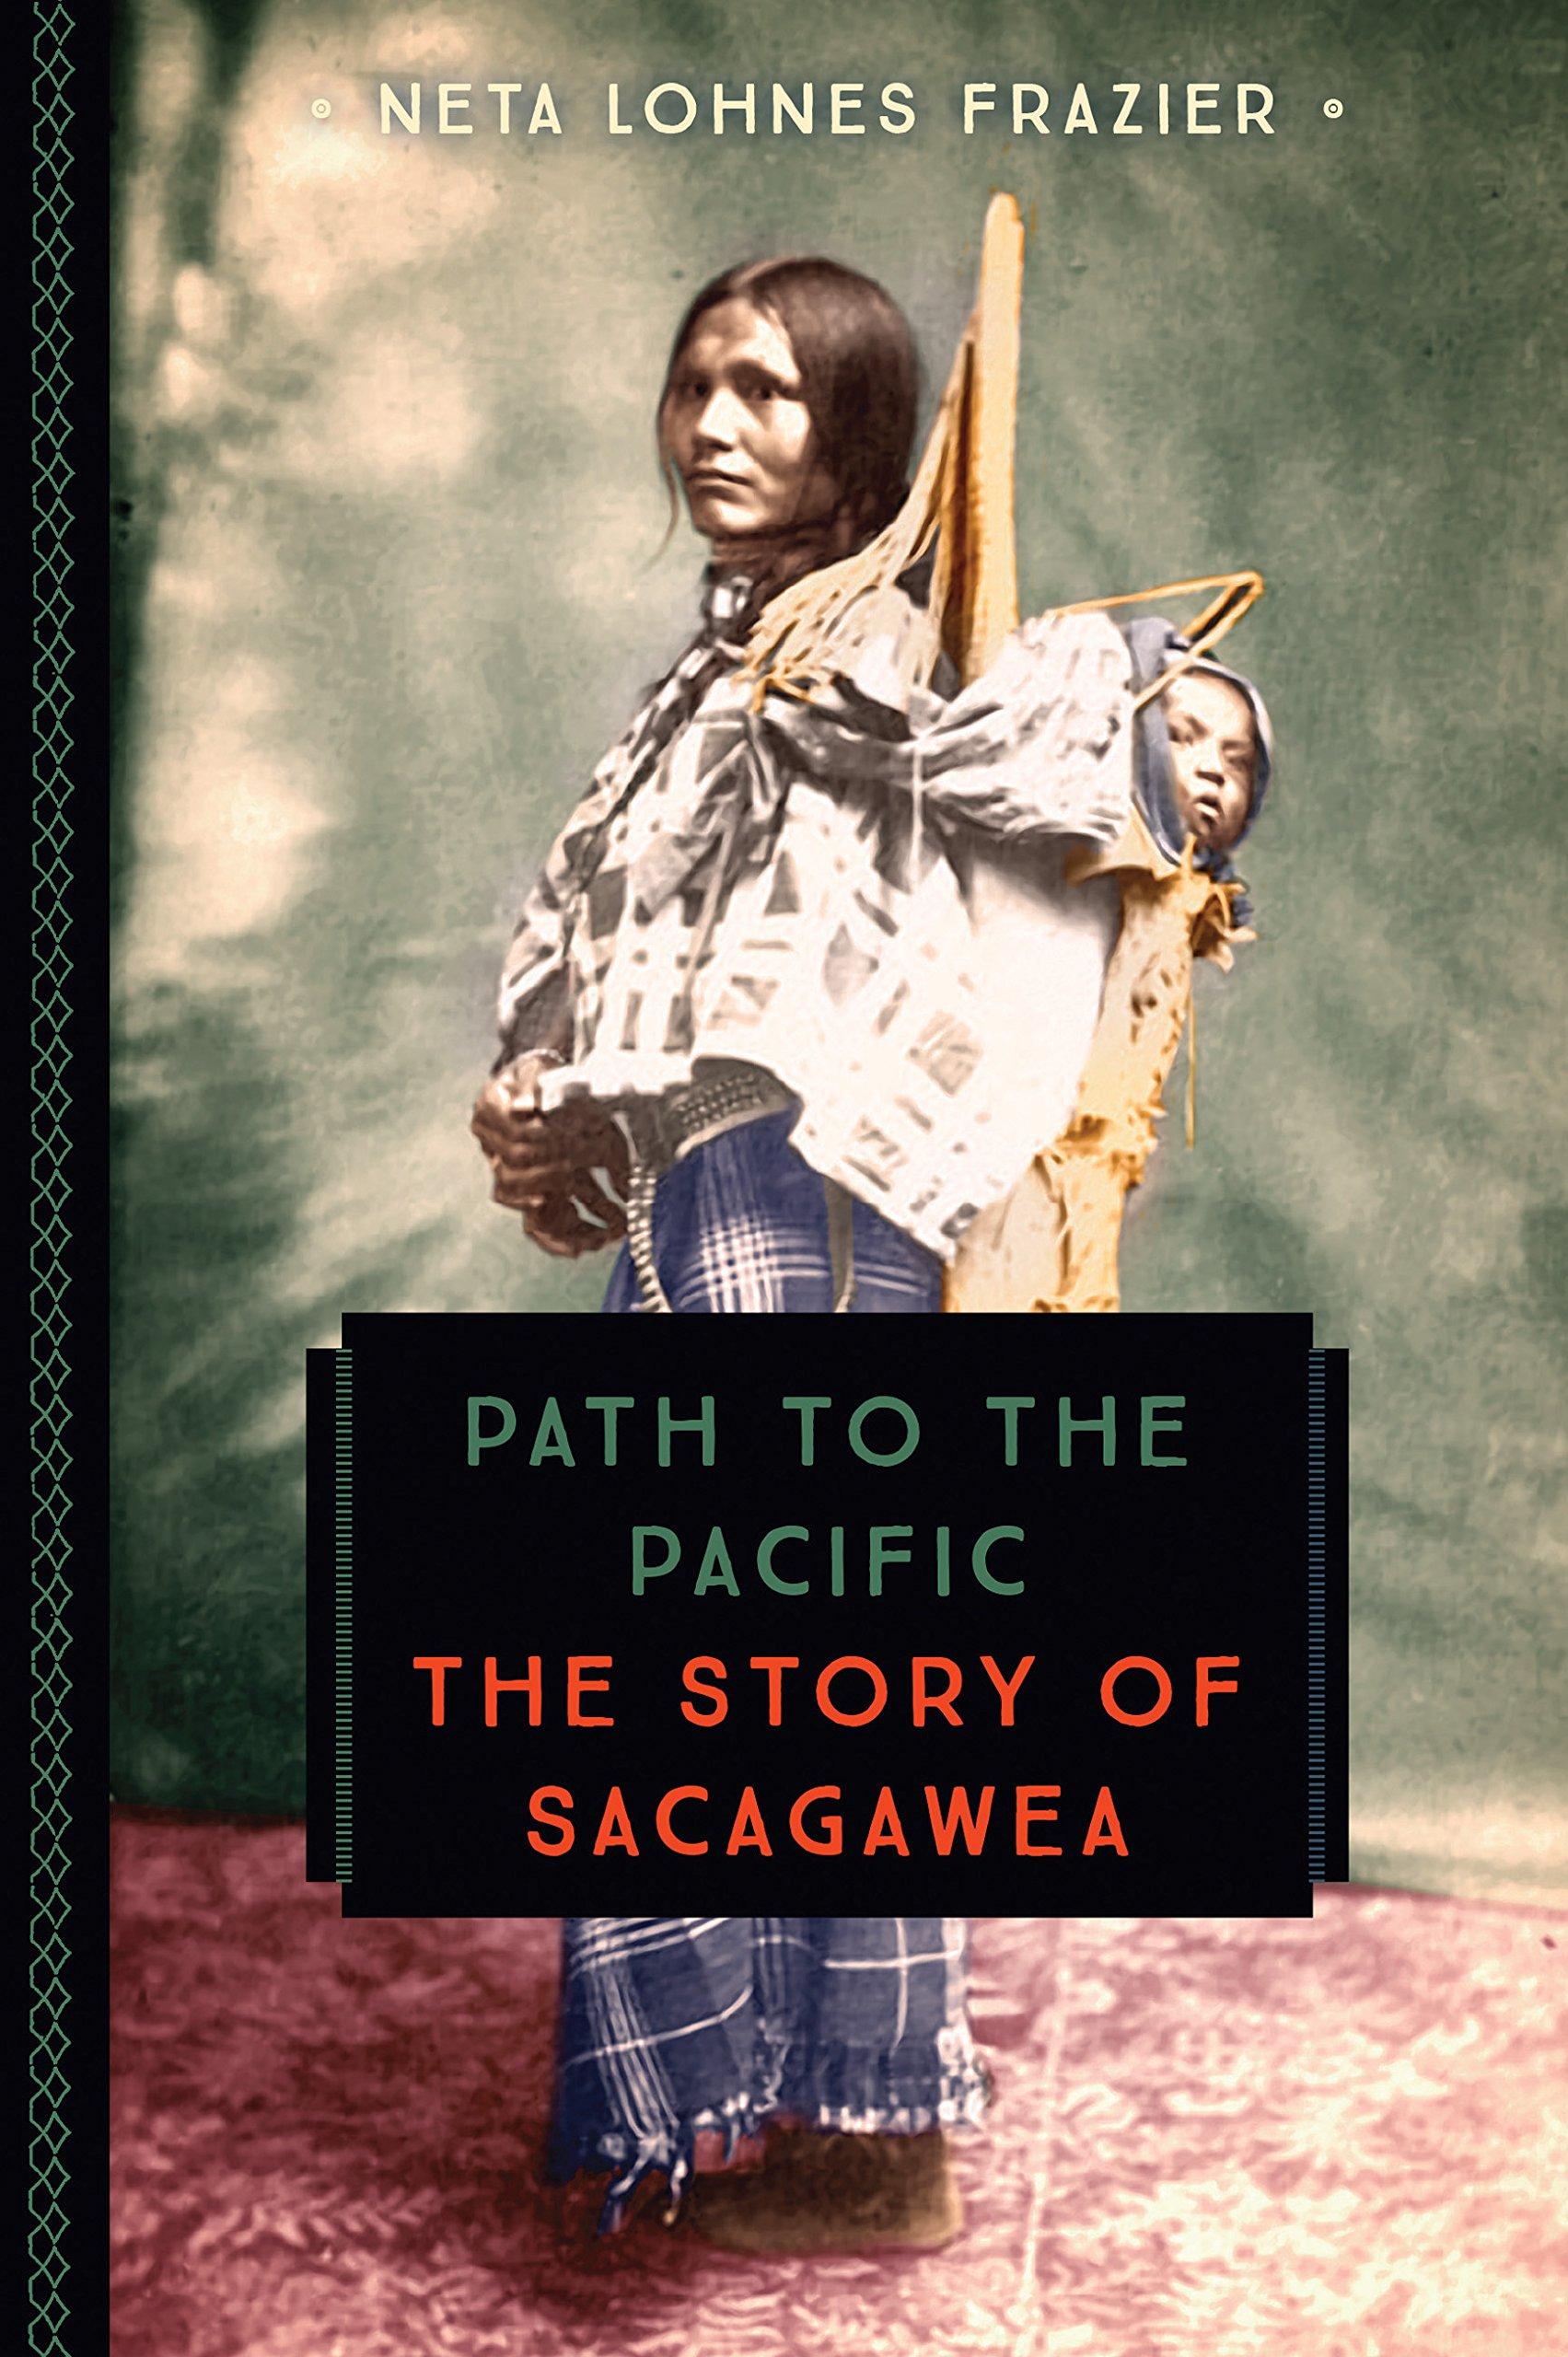 Download Path to the Pacific: The Story of Sacagawea (833) pdf epub